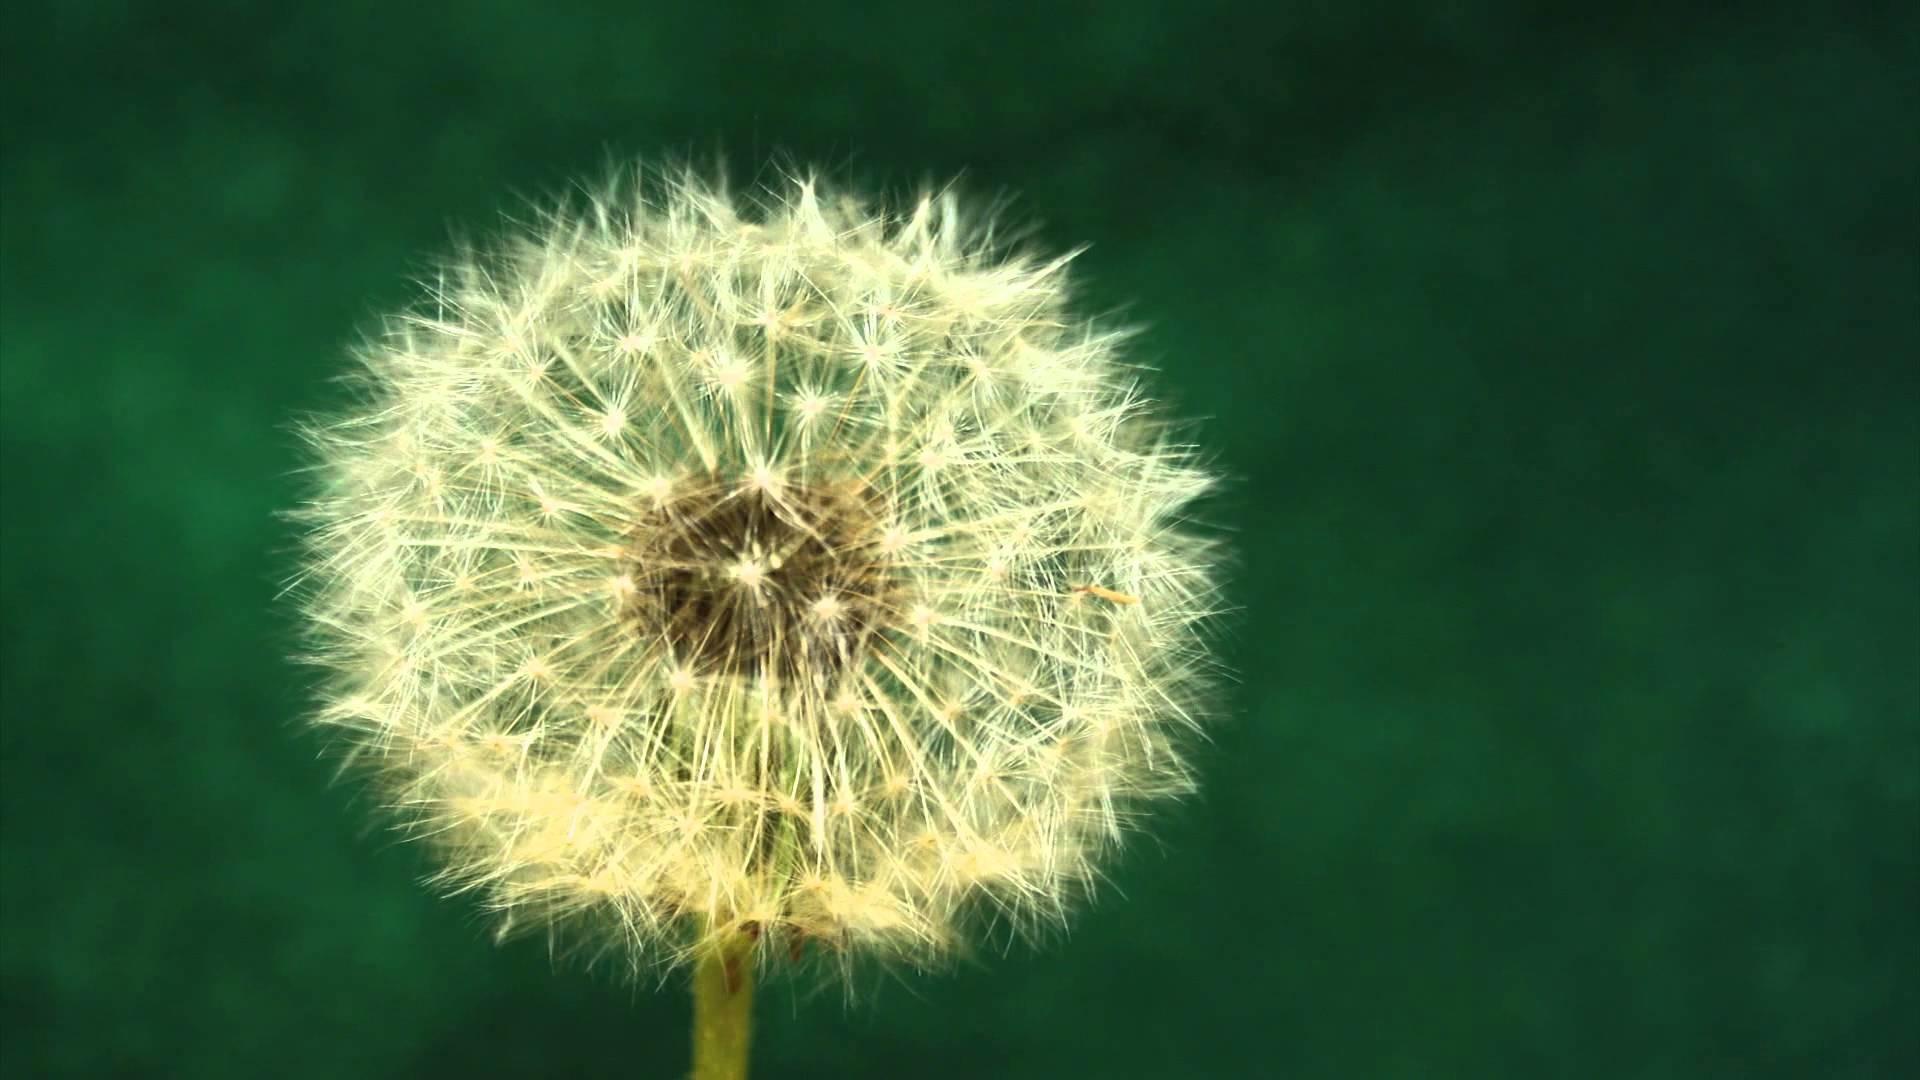 Res: 1920x1080, Dandelion seeds blowing